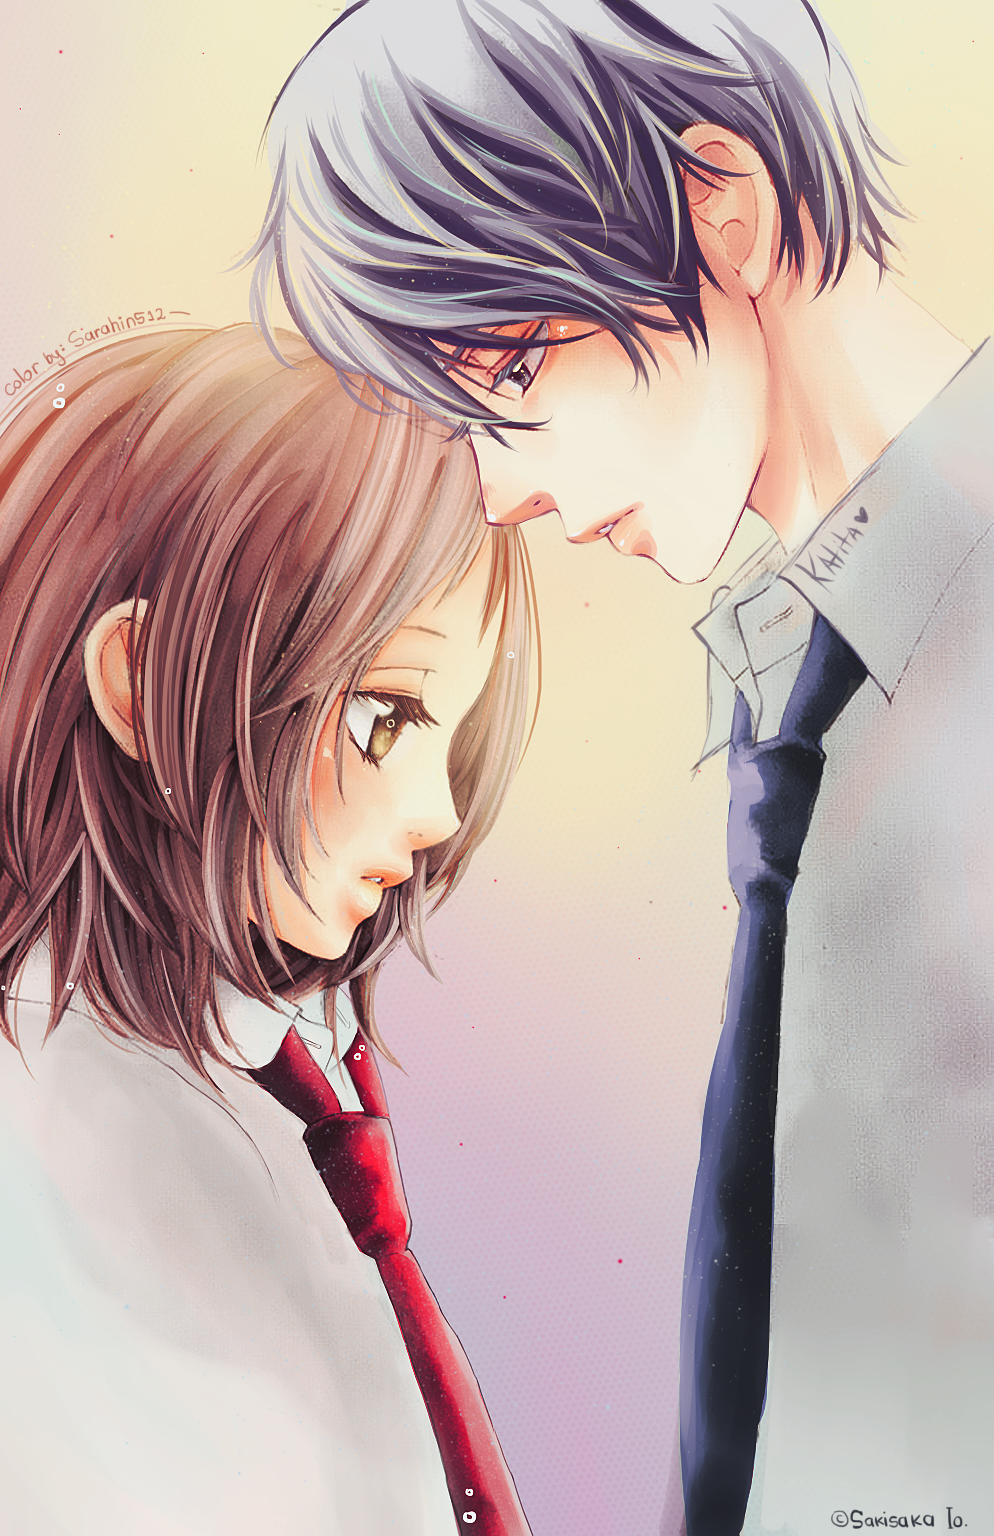 I Love You Wallpaper Boy And Girl : Strobe Edge - collab Sarahin and Katita by katita-chan on DeviantArt